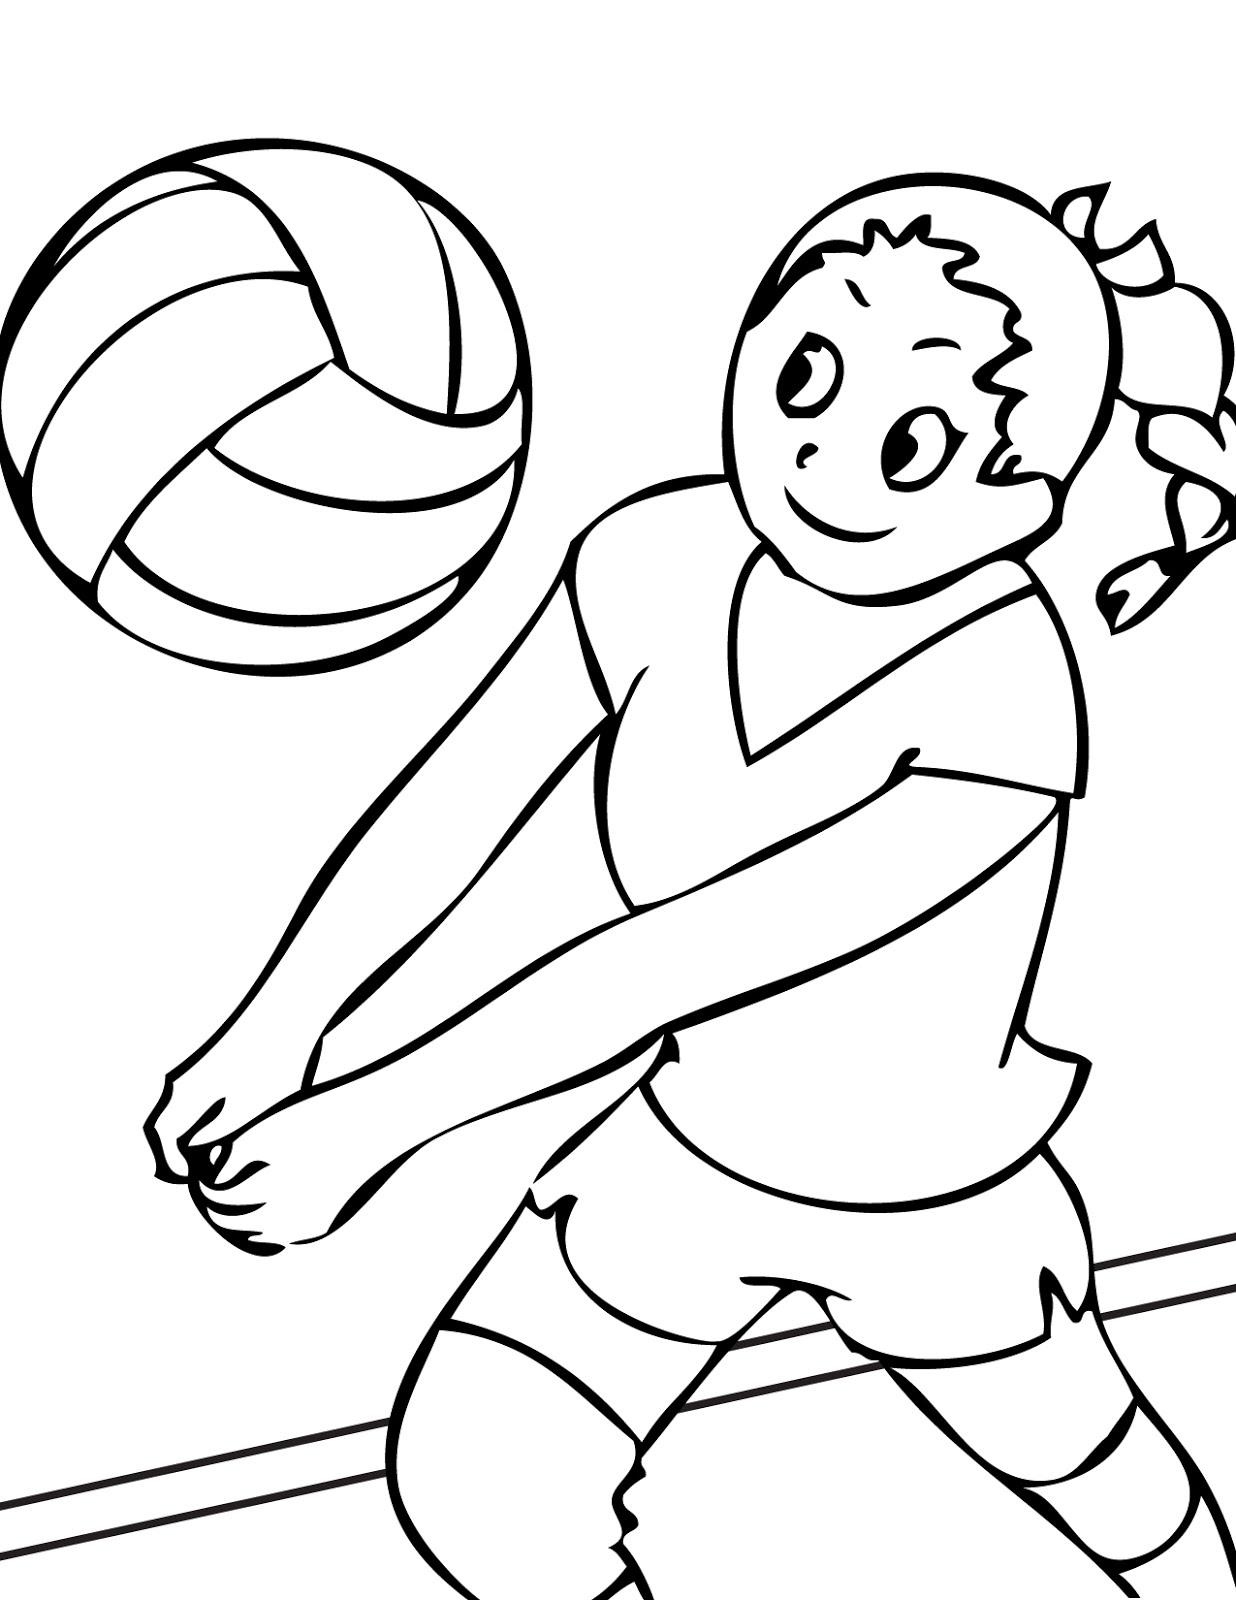 sports coloring pages for kids. Black Bedroom Furniture Sets. Home Design Ideas